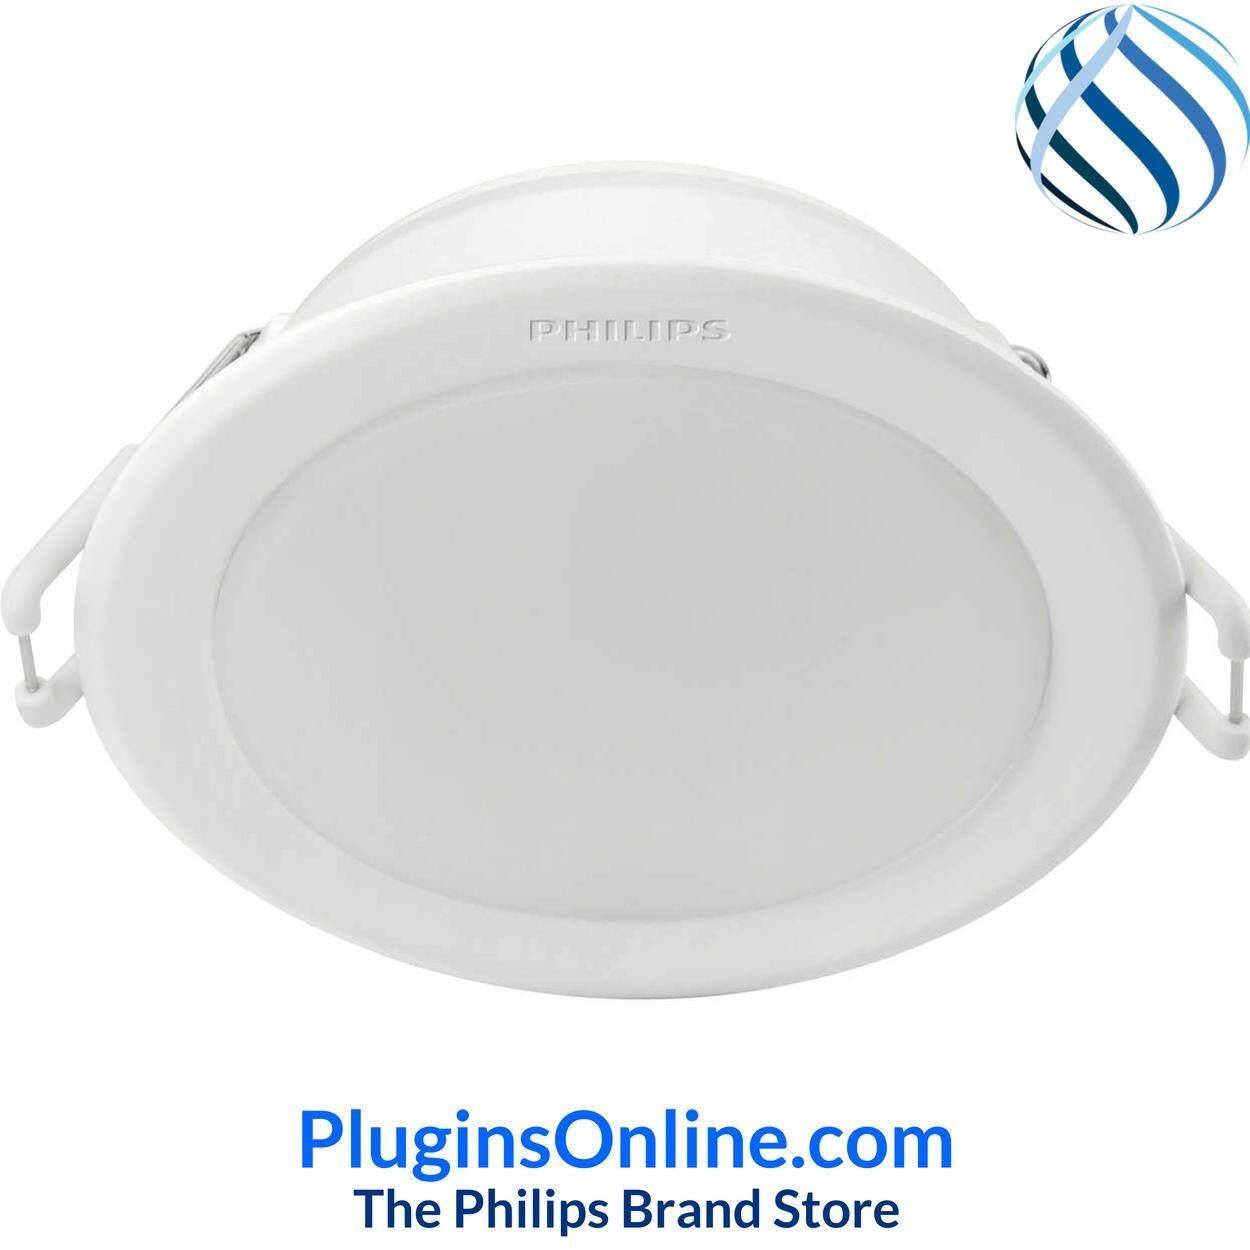 Philips 59202 Smalu LED Downlight (CoolWhite)